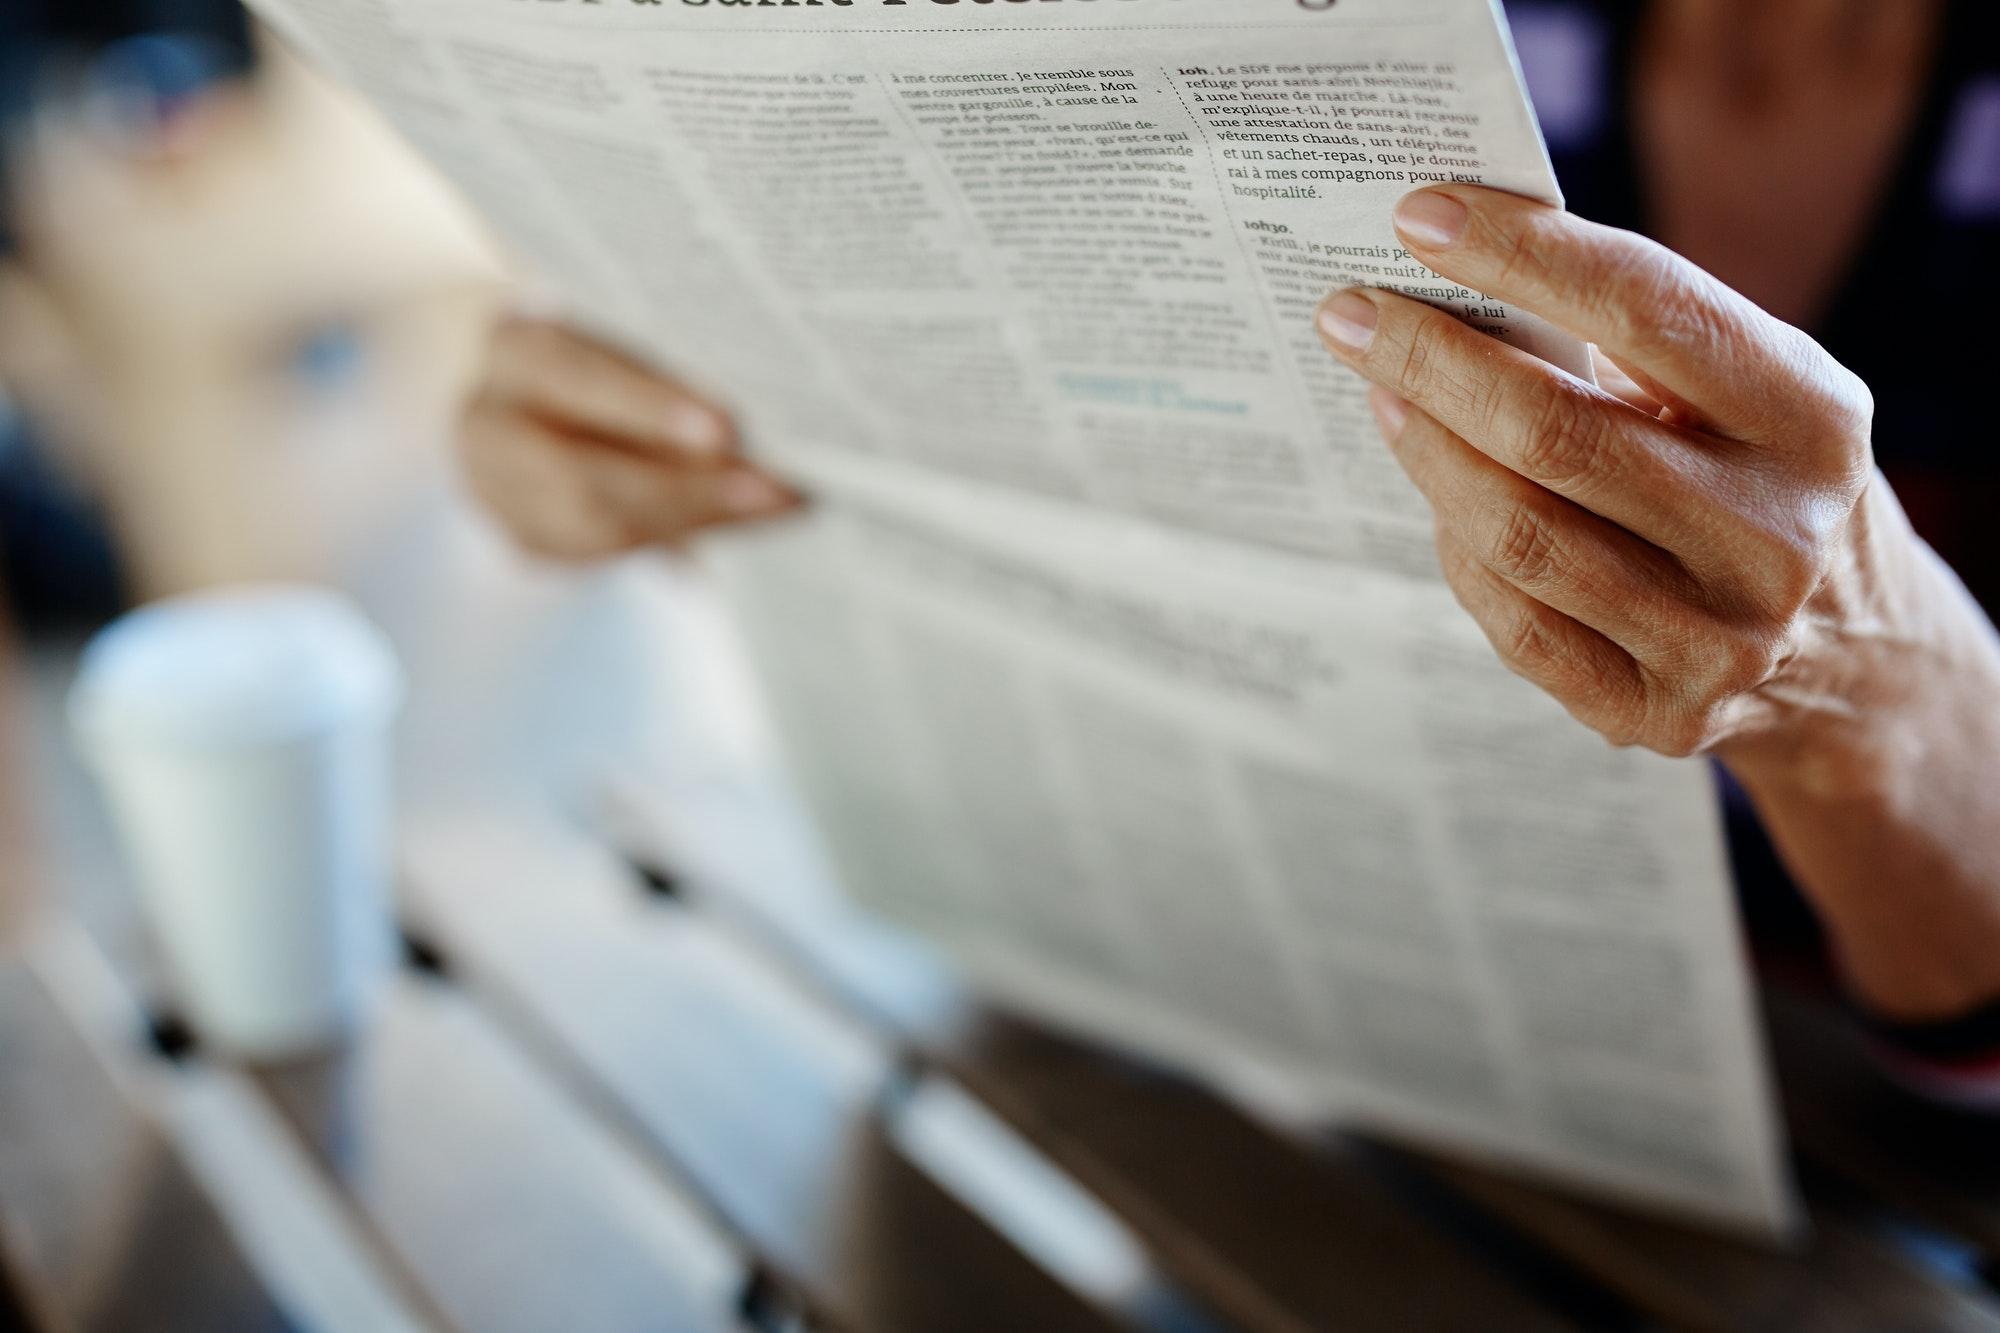 Article in newspaper